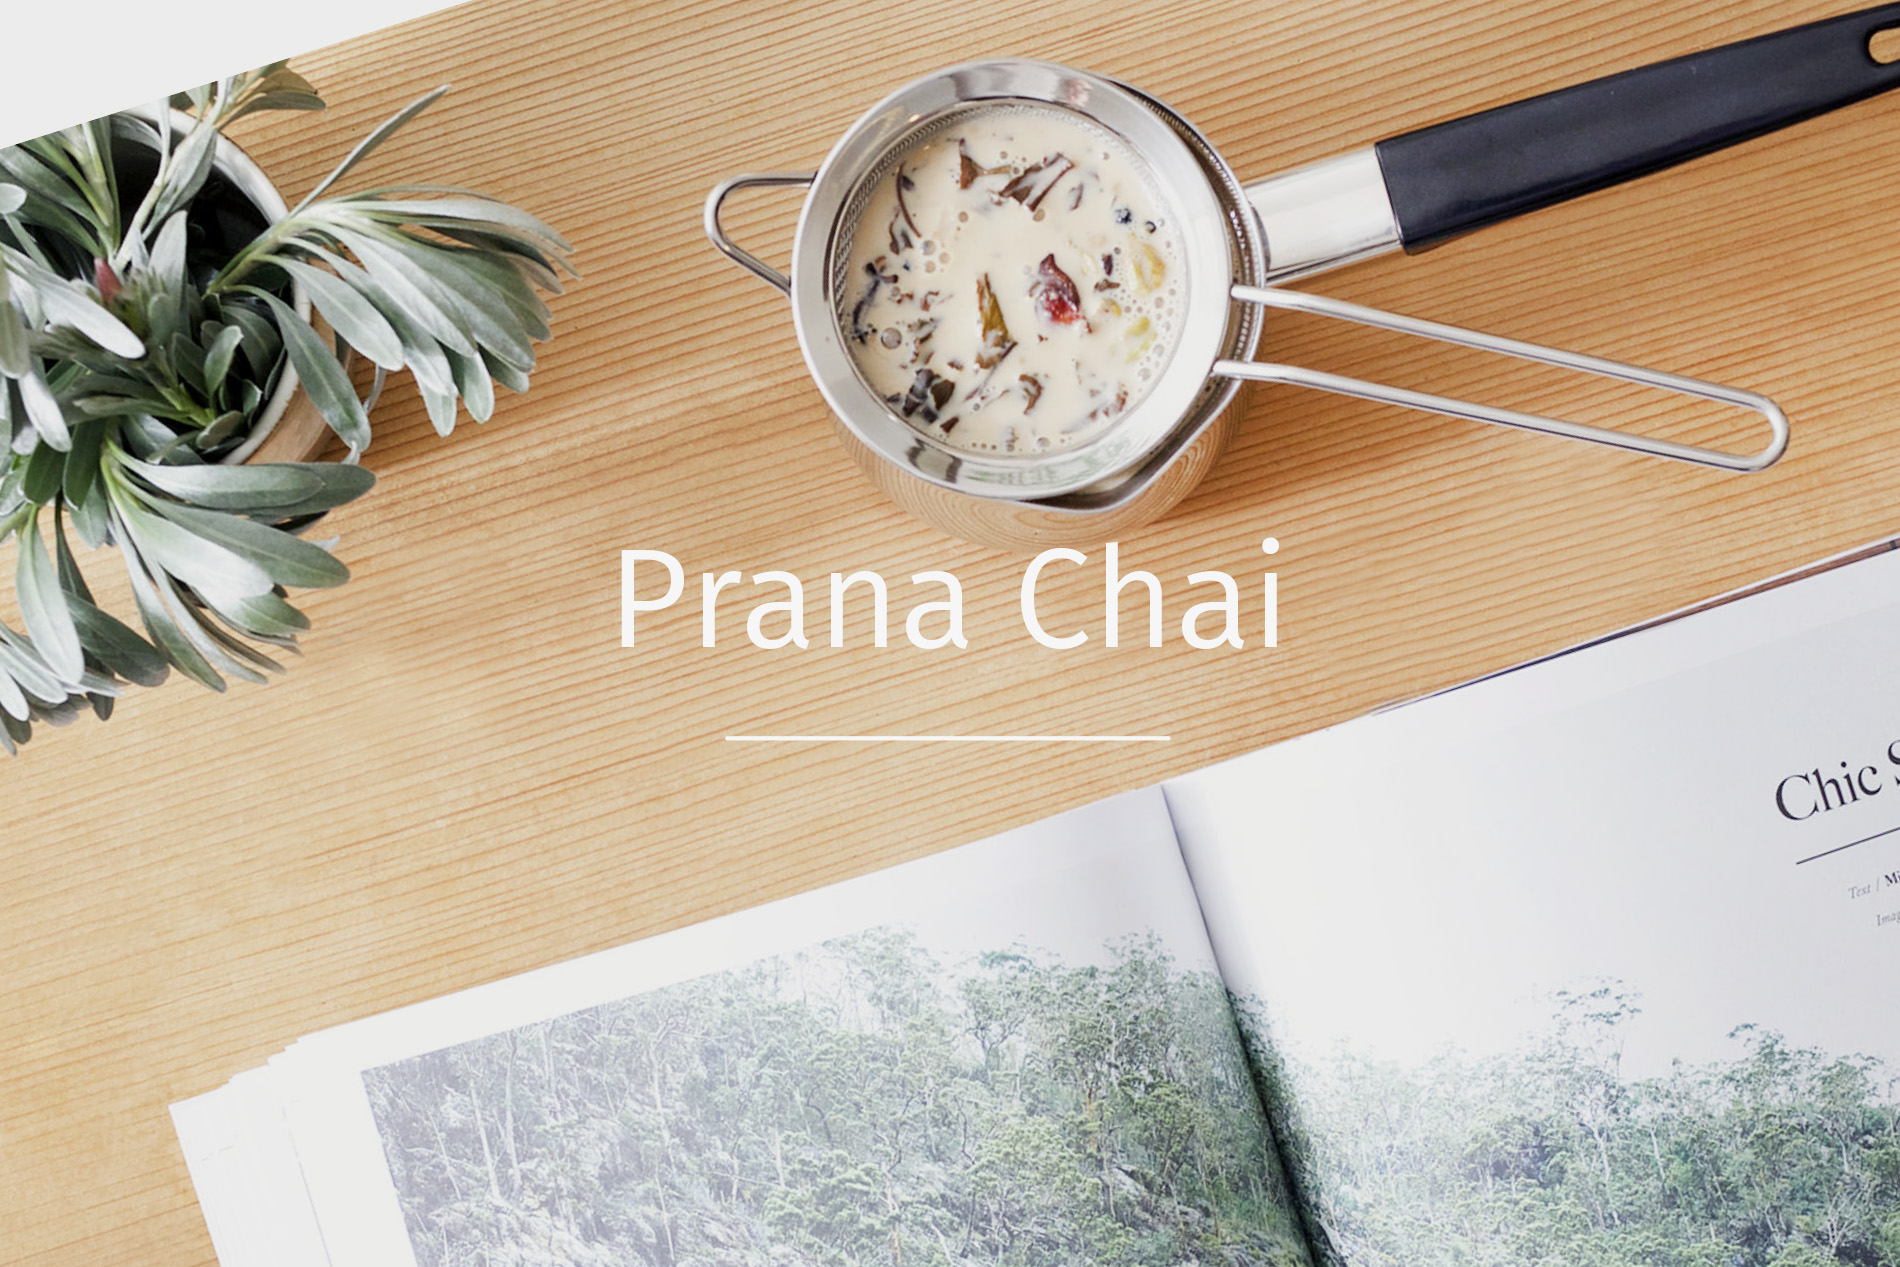 Prana Chai